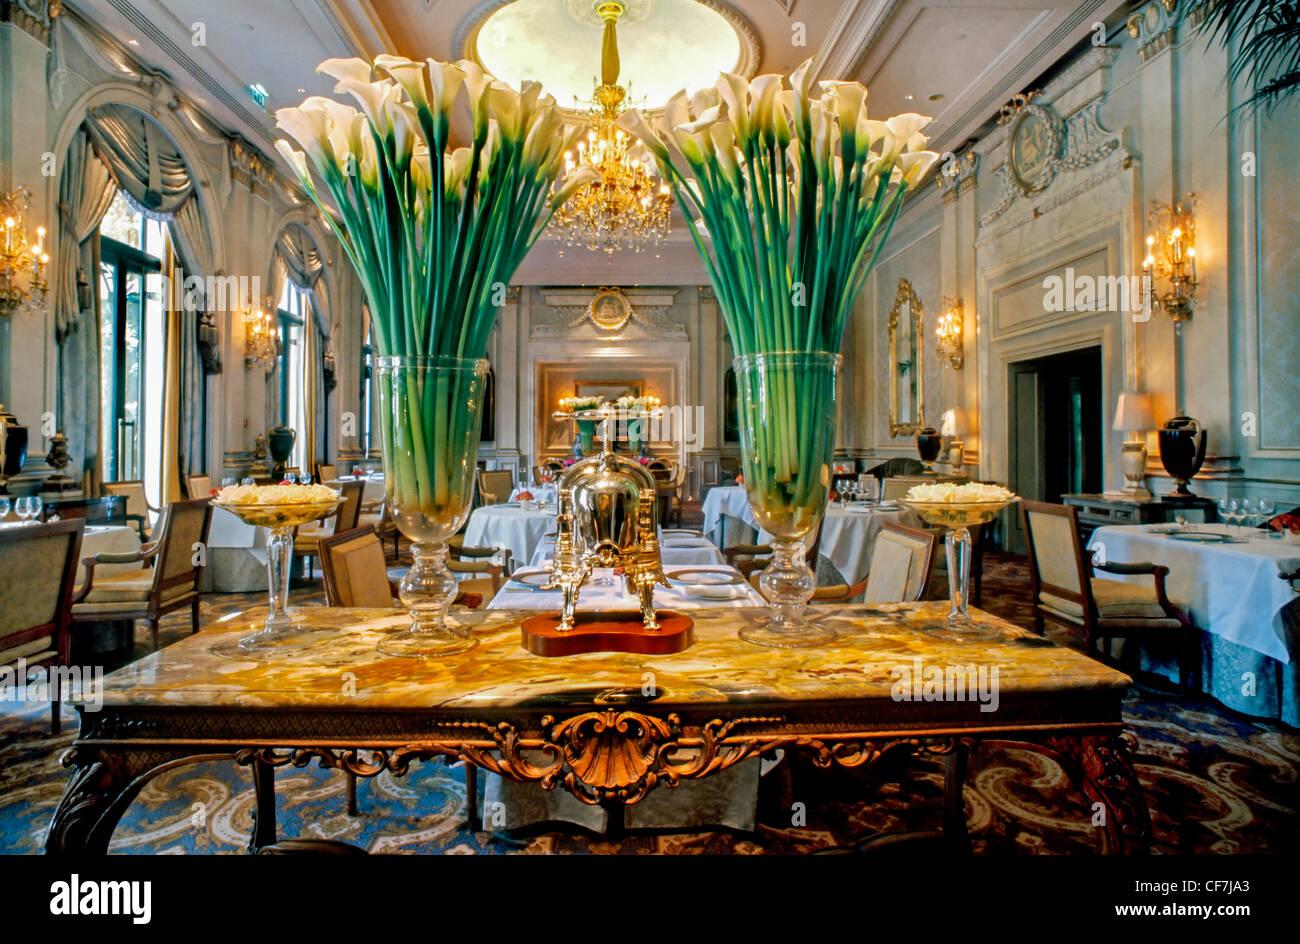 France paris fancy french restaurant interior decor le for Design hotels in france